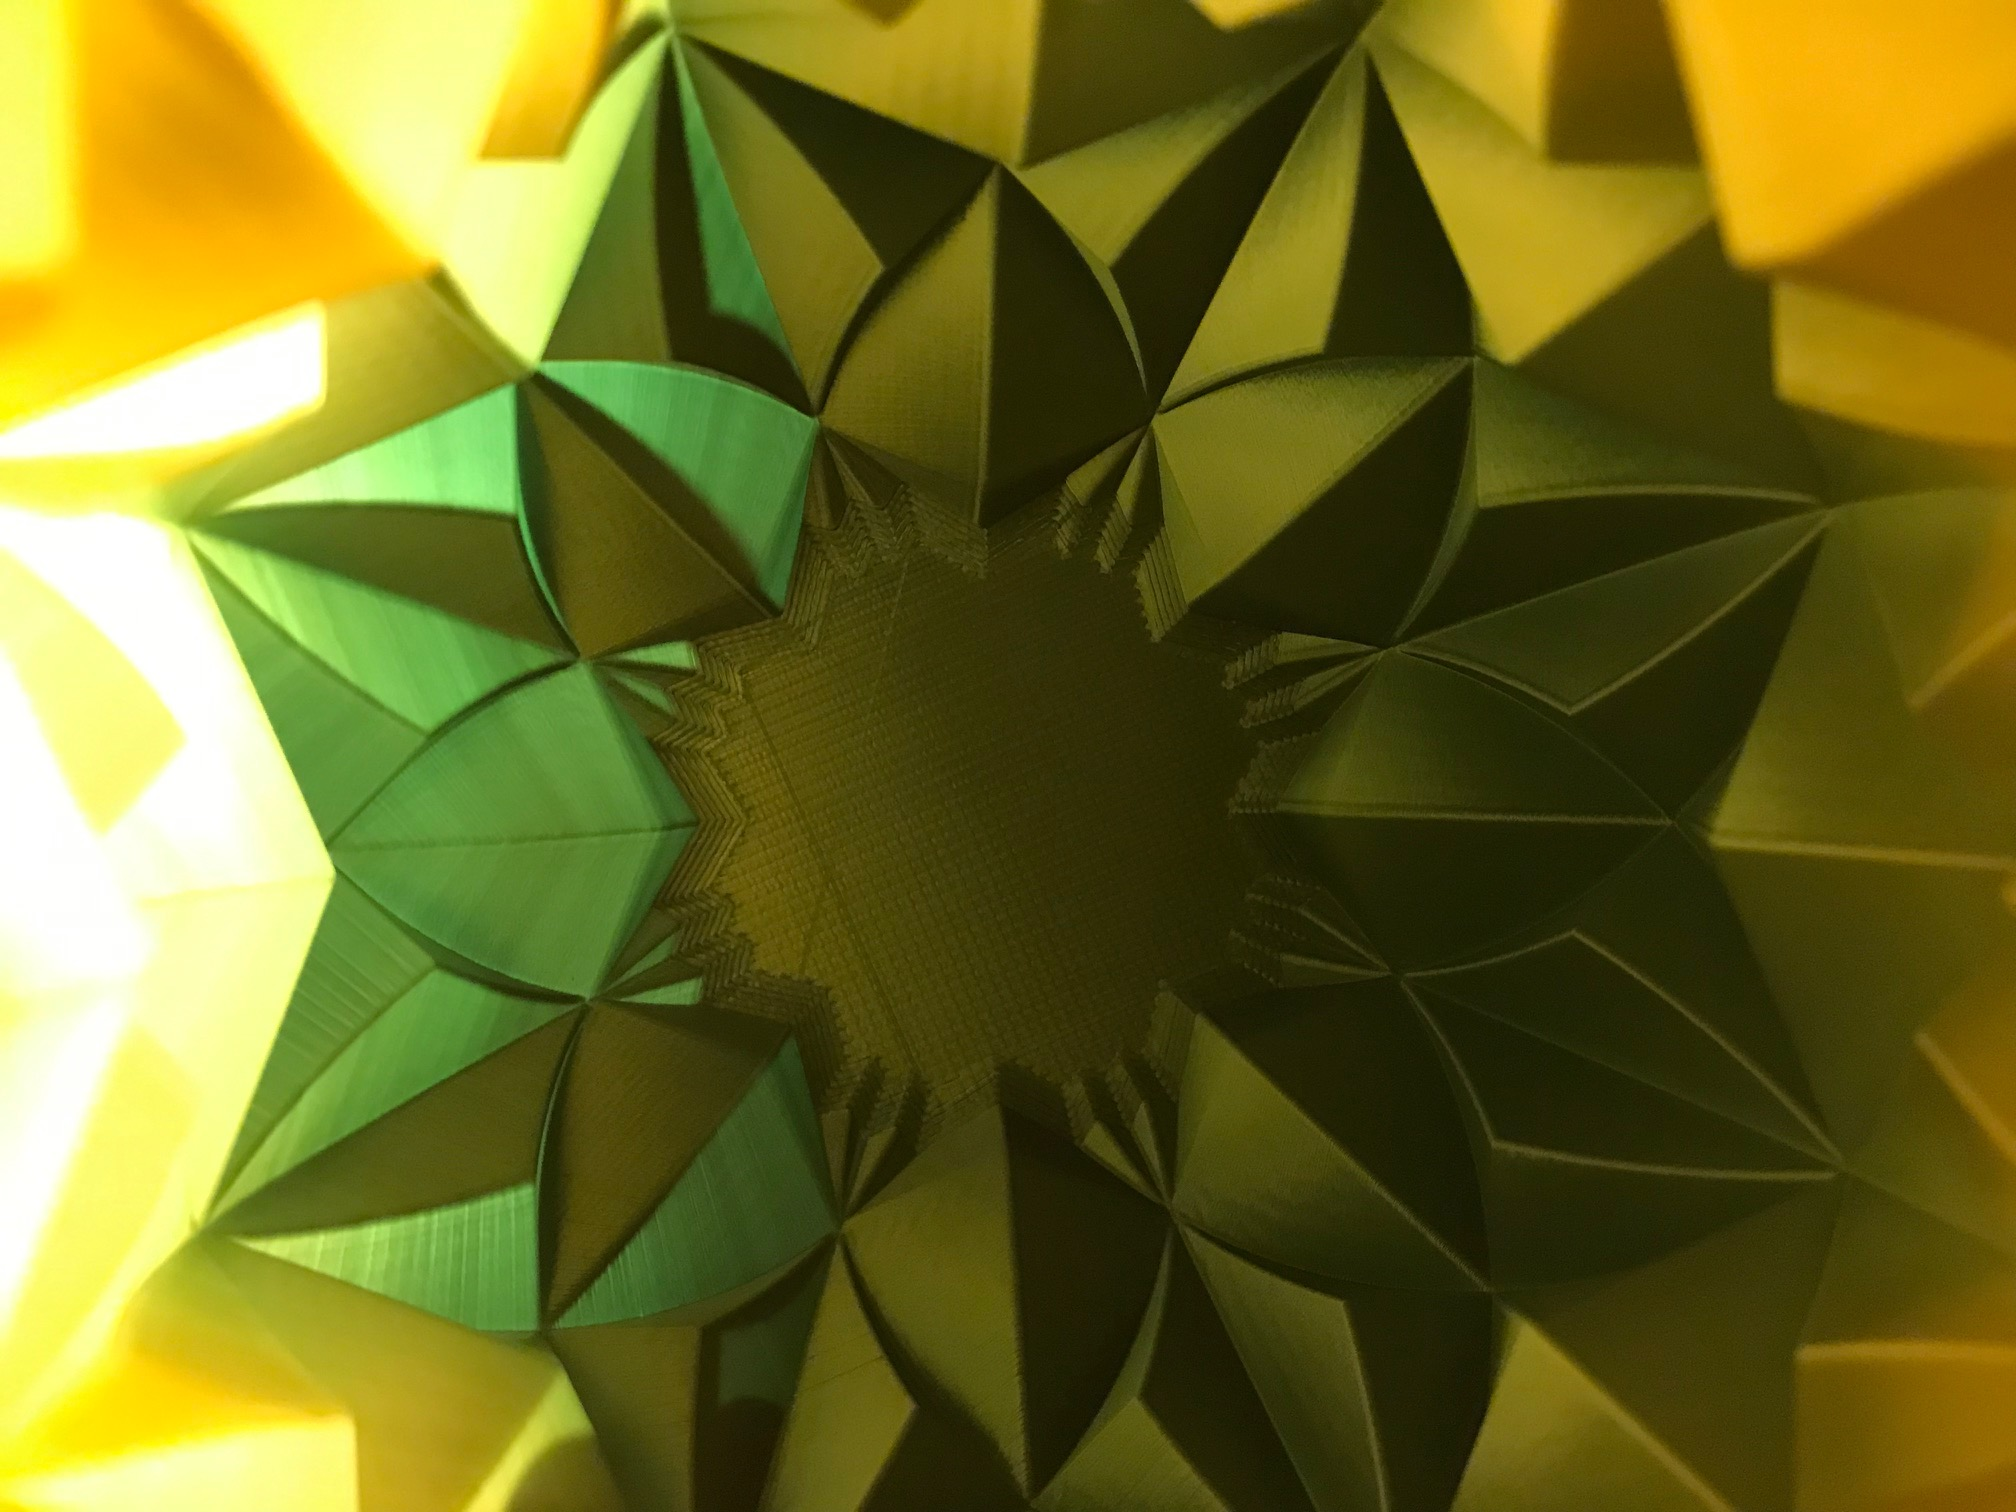 IMG_5265.jpg Download free STL file Retro vase • 3D printing design, Brithawkes